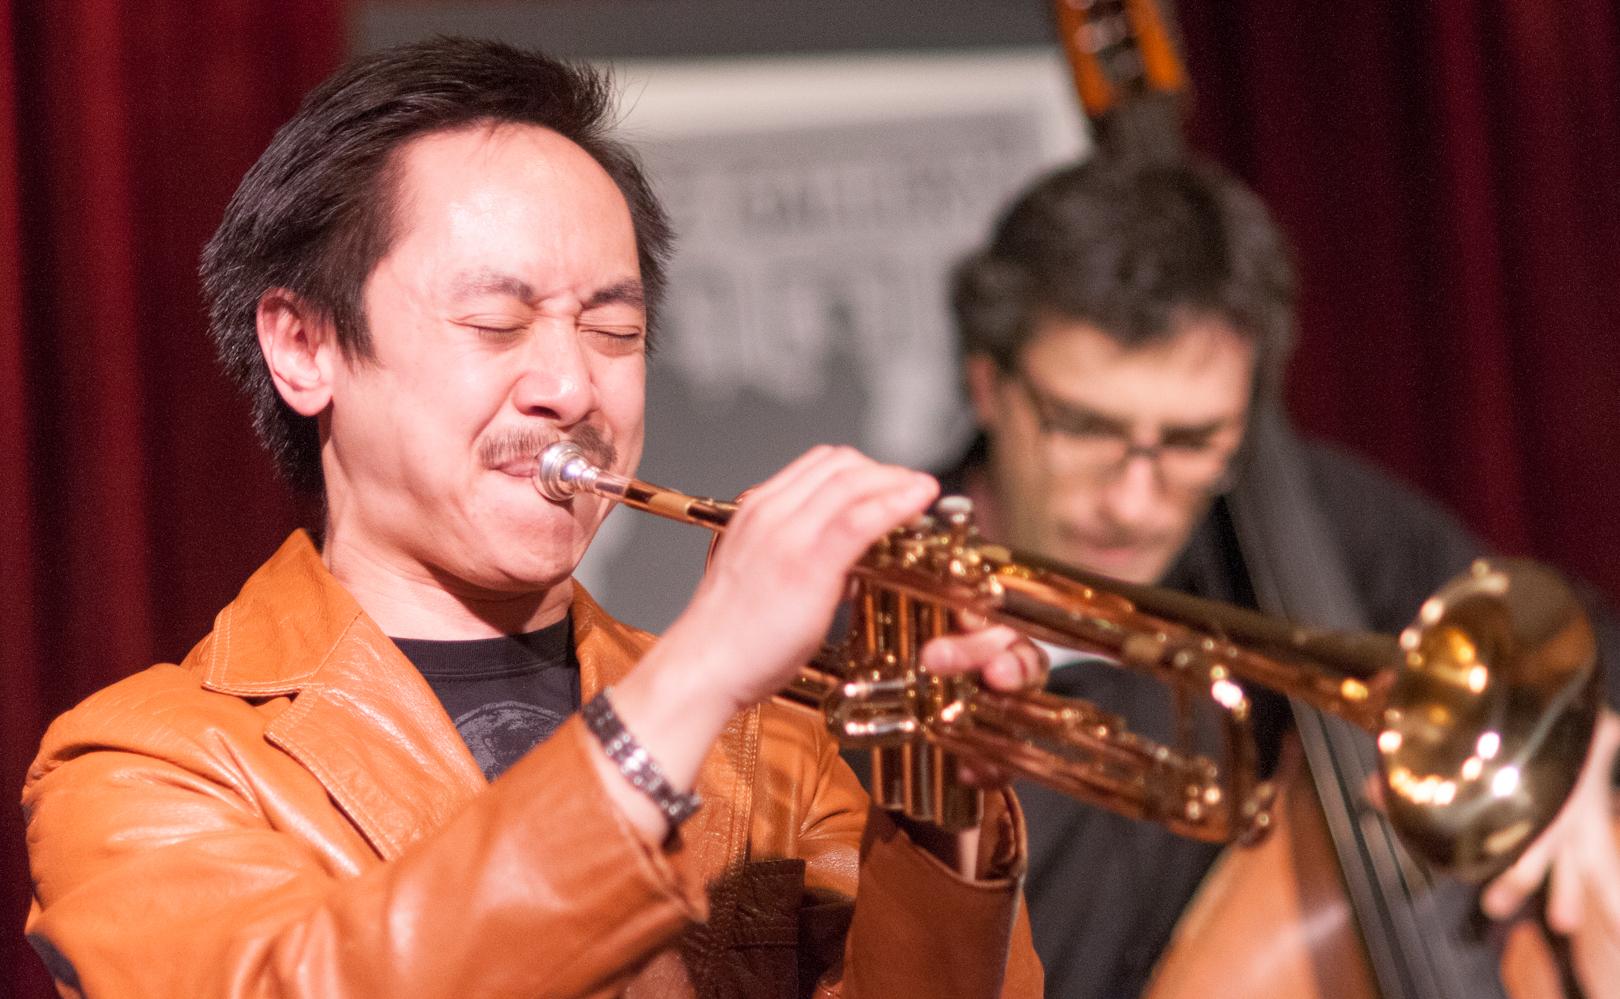 Gordon Au and Joseph Lepore with the Melissa Aldana Quartet at the Jazz Gallery